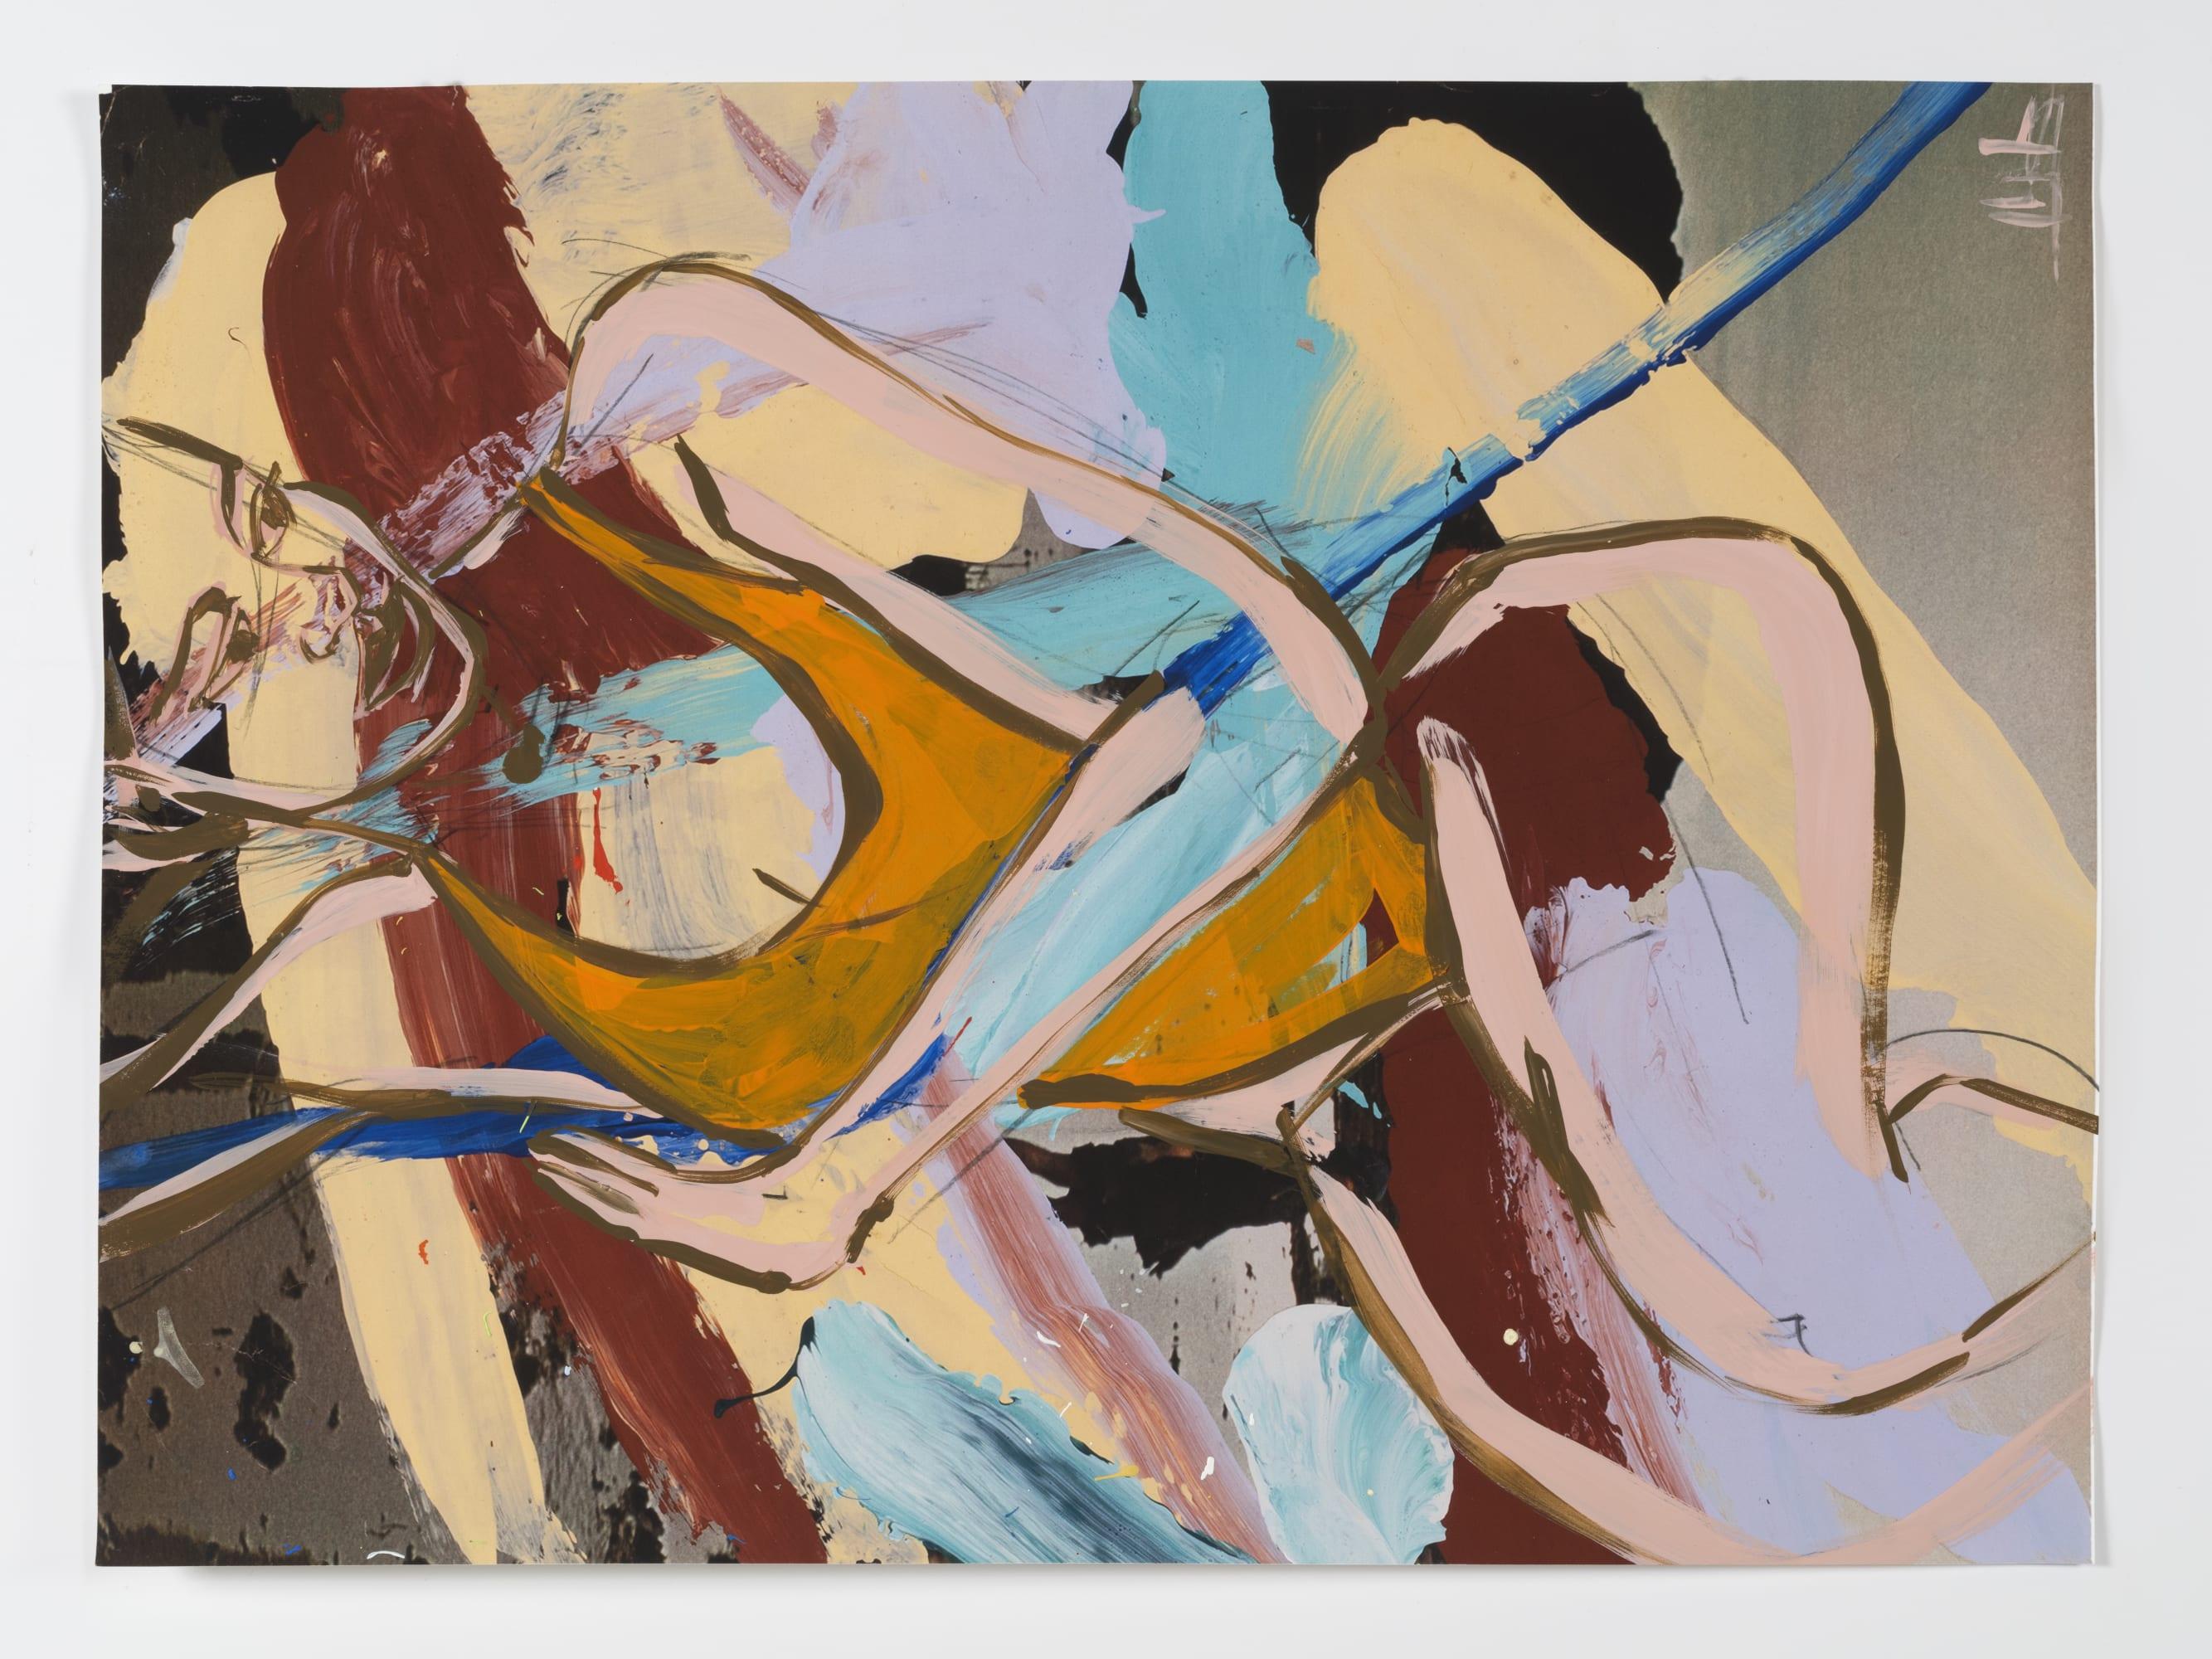 David Salle, Untitled, 2019